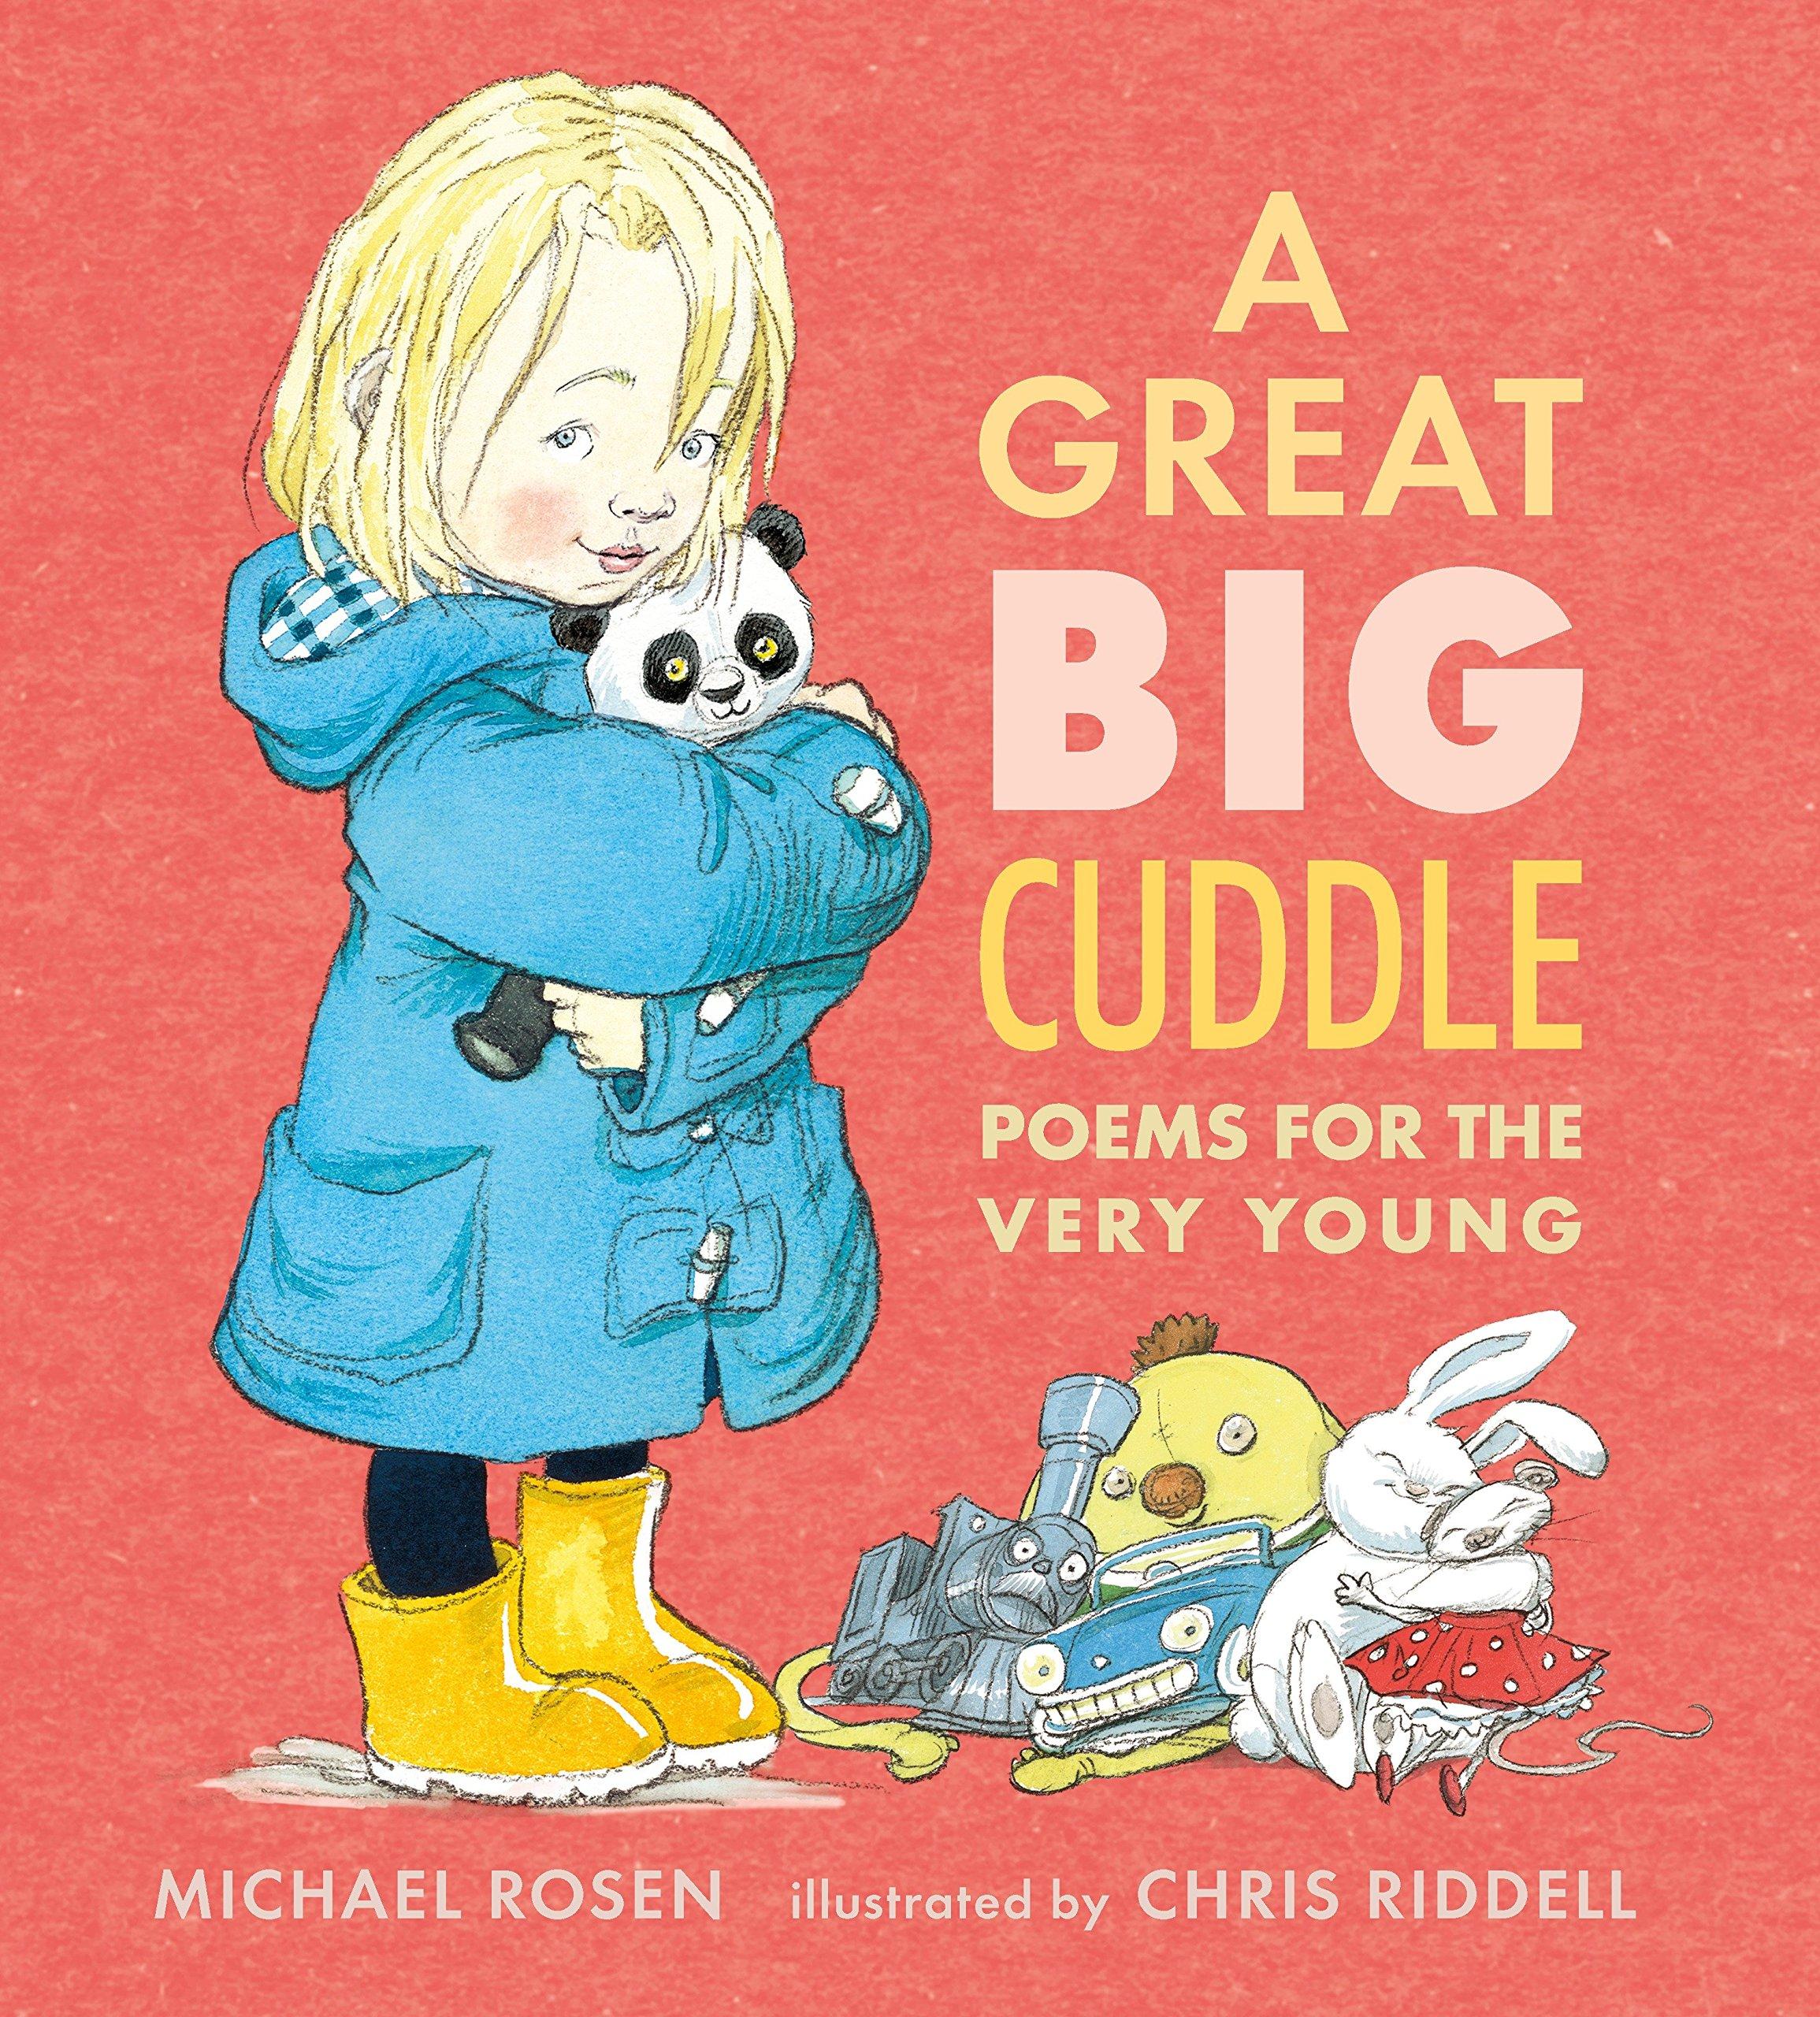 A Great Big Cuddle book cover